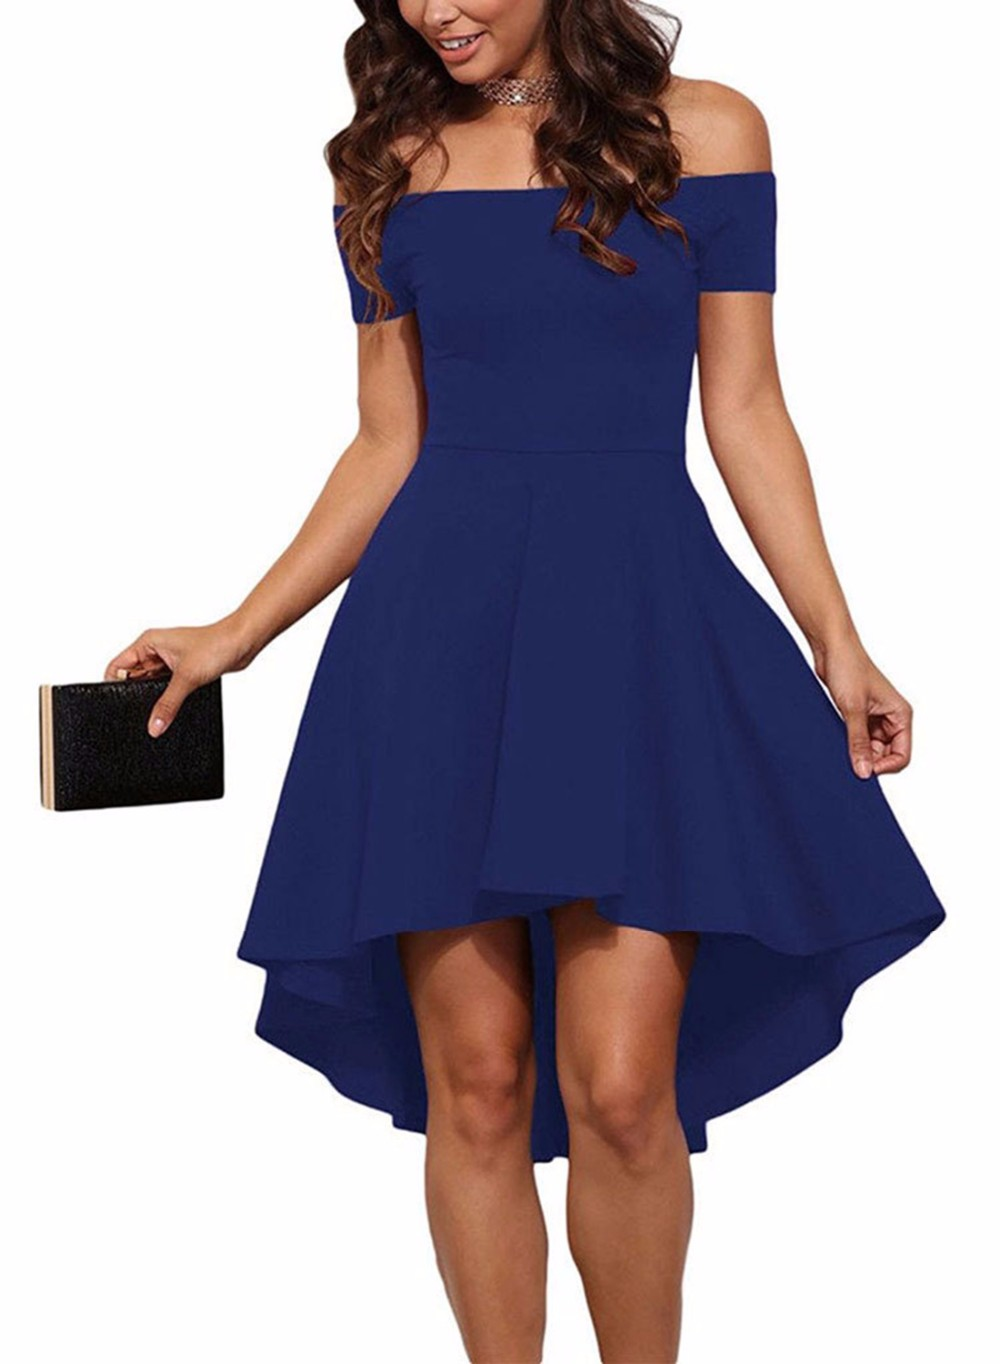 women-s-slash-neck-slim-pleated-high-low-dress